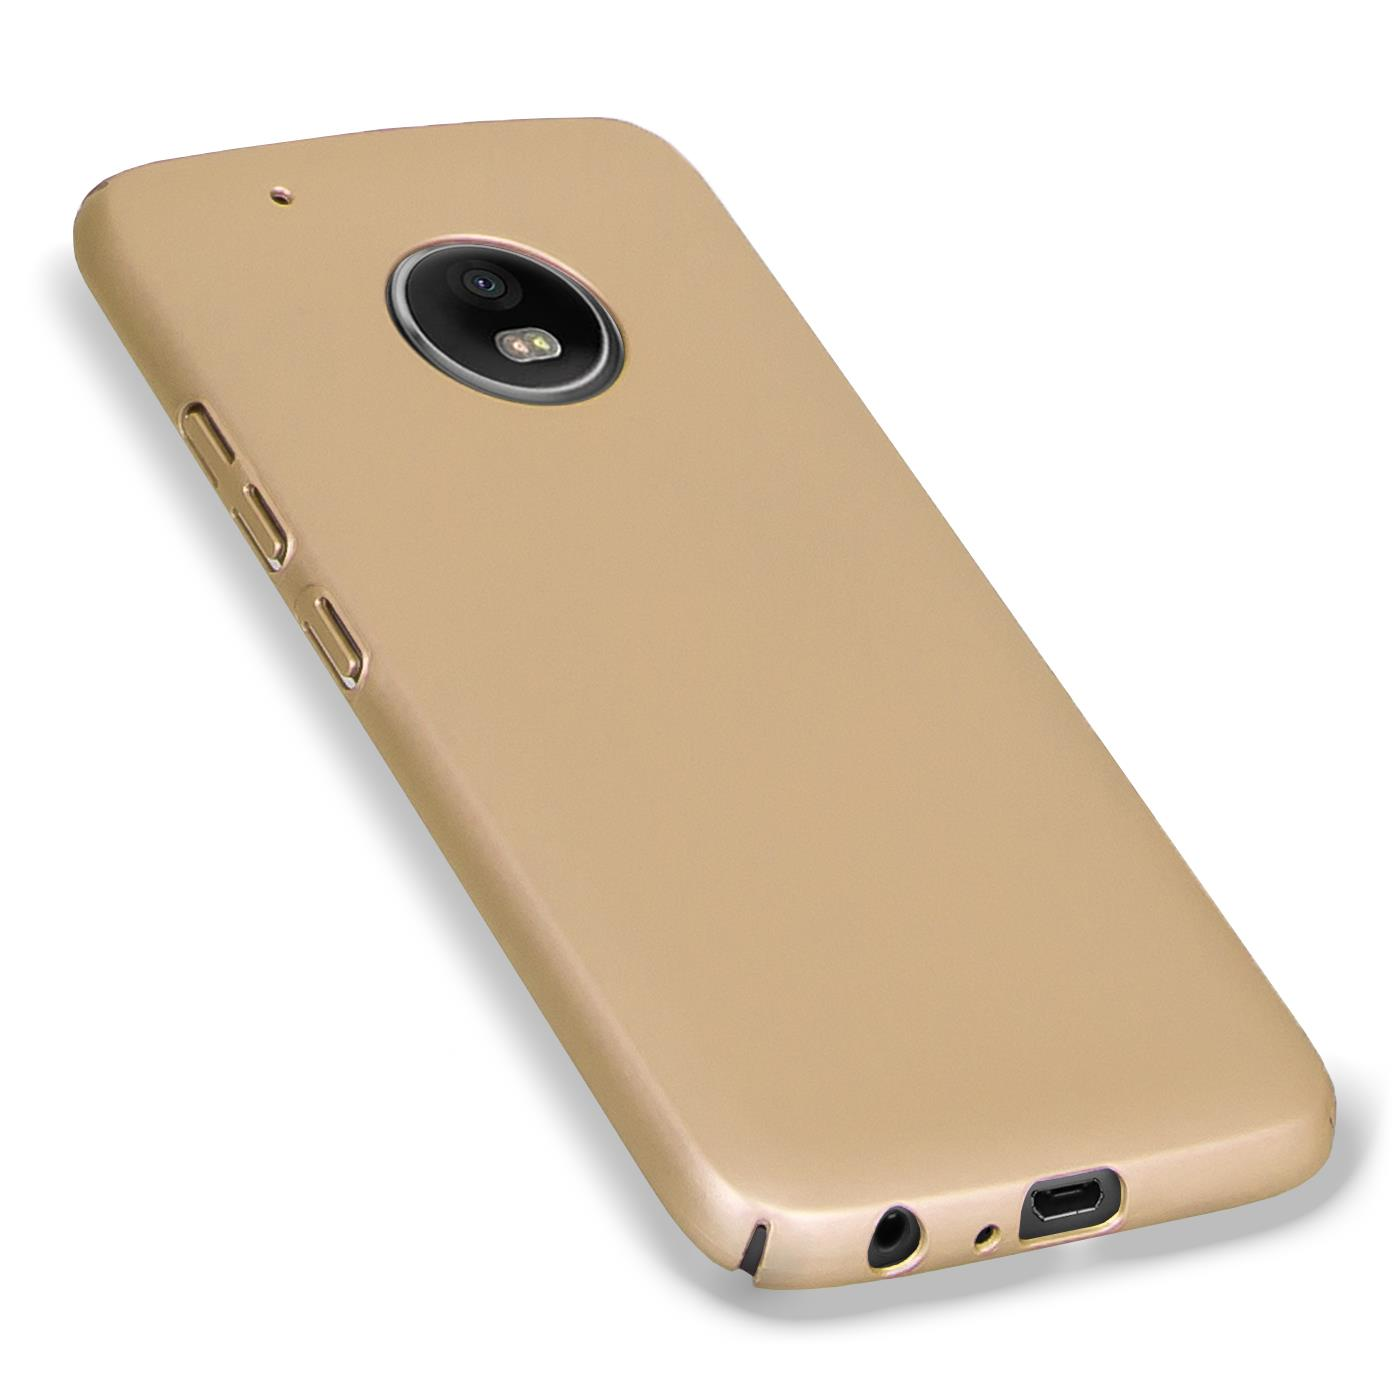 Motorola-Lenovo-Moto-G5-Huelle-Hardcase-Case-Schutz-Cover-Slim-Tasche-Handyhuelle Indexbild 6